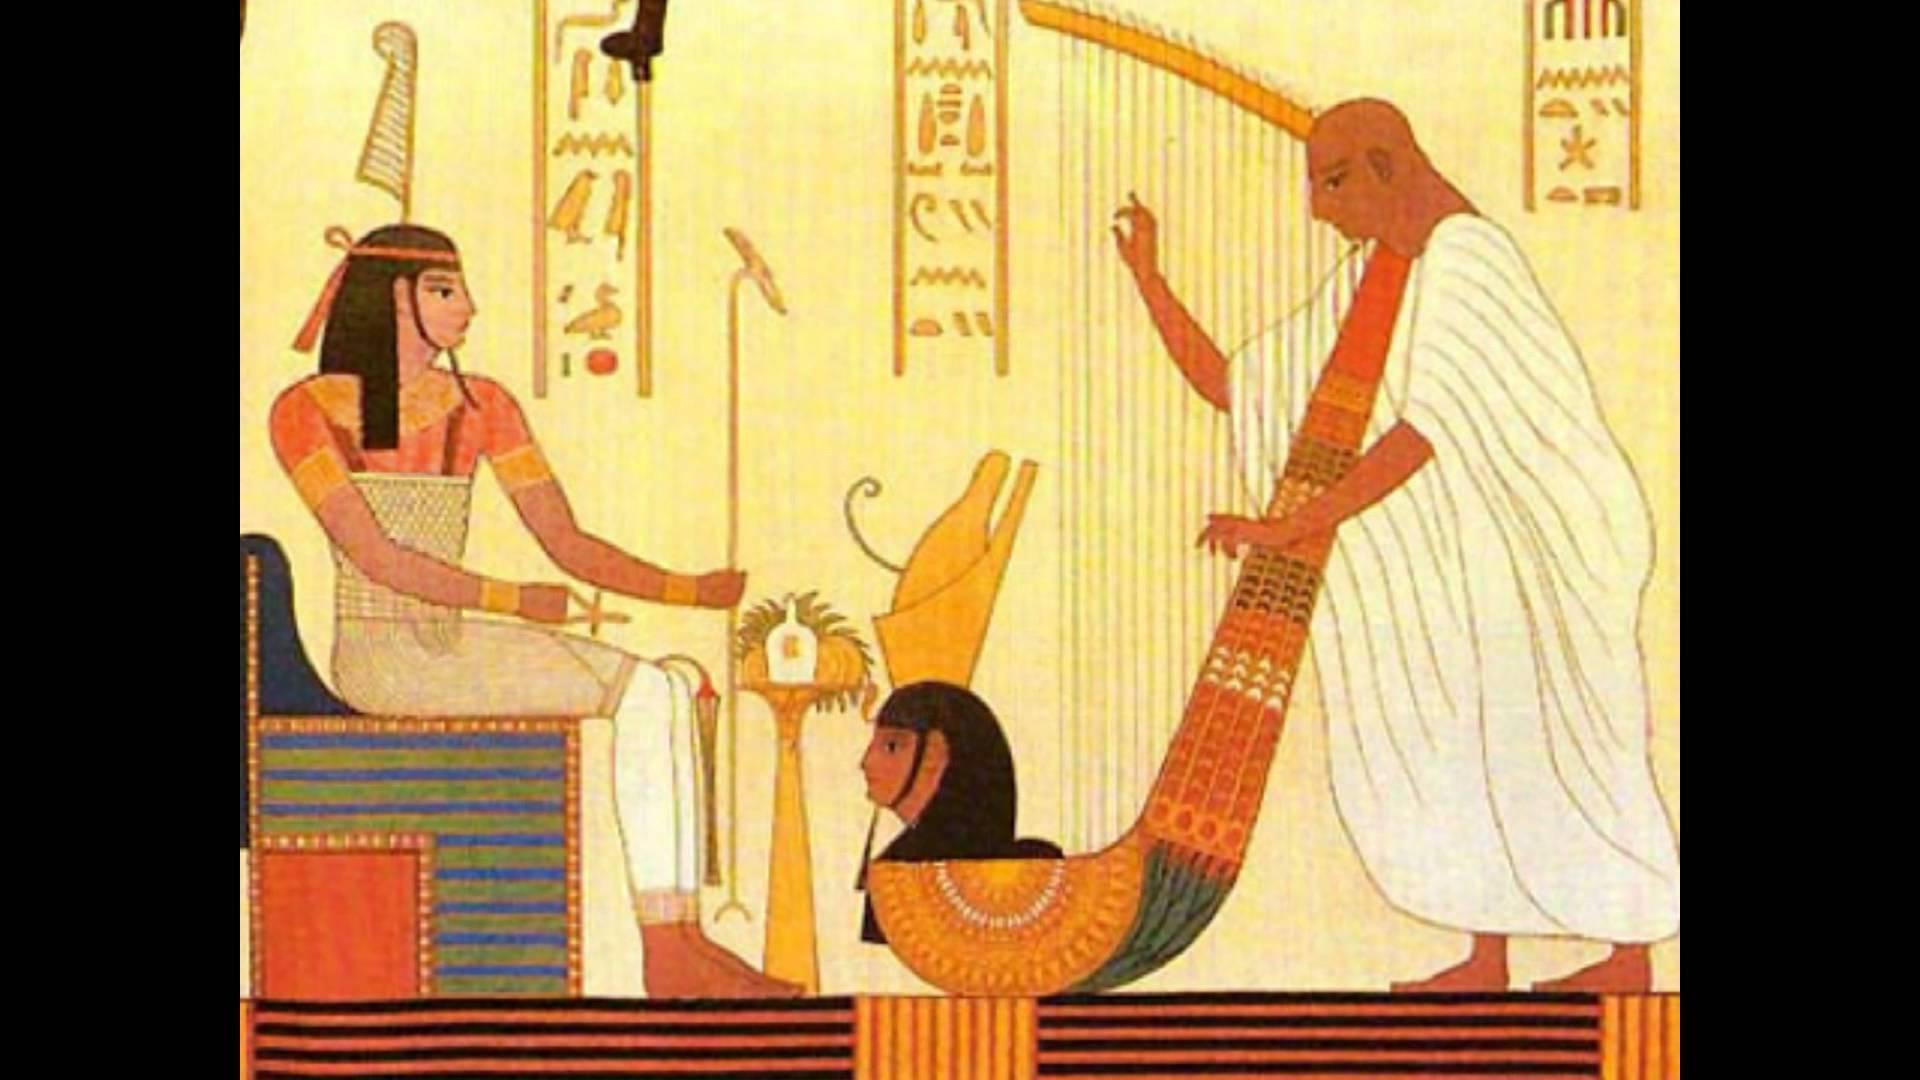 1920x1080 Ancient Egyptian Art